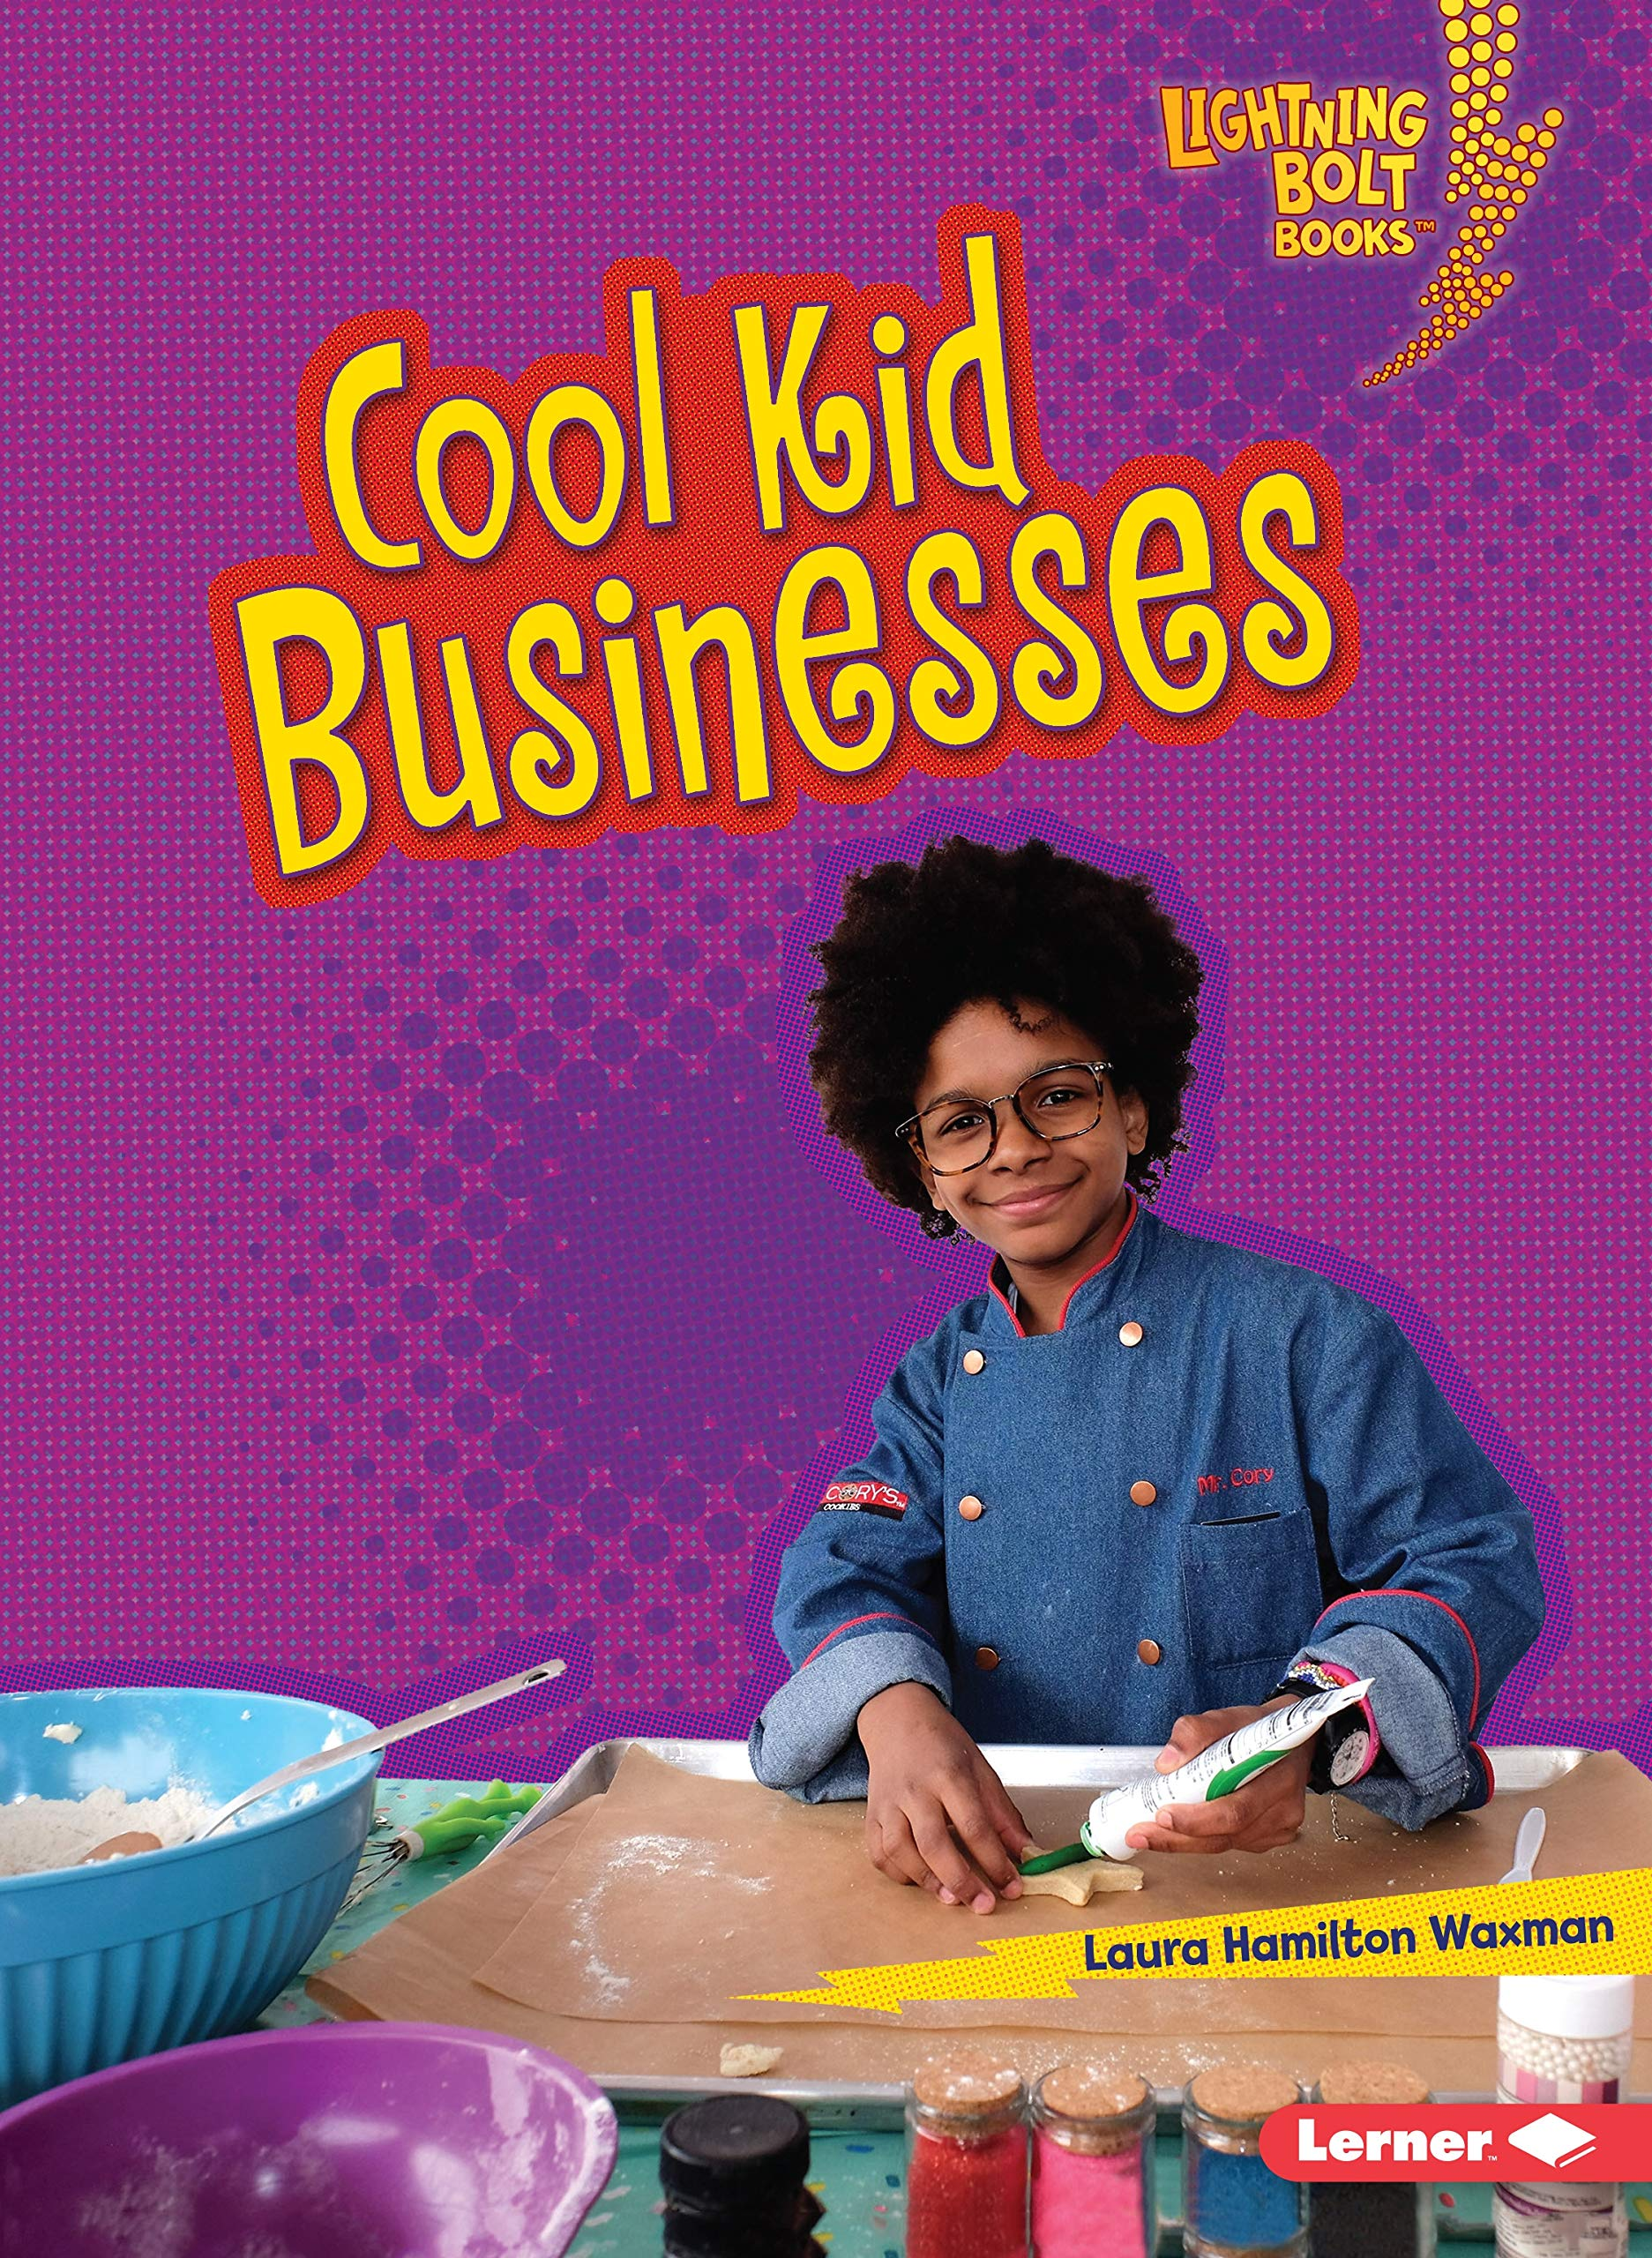 Cool Kid Businesses Lightning Bolt Books Kids In Charge Waxman Laura Hamilton 9781541589117 Amazon Com Books